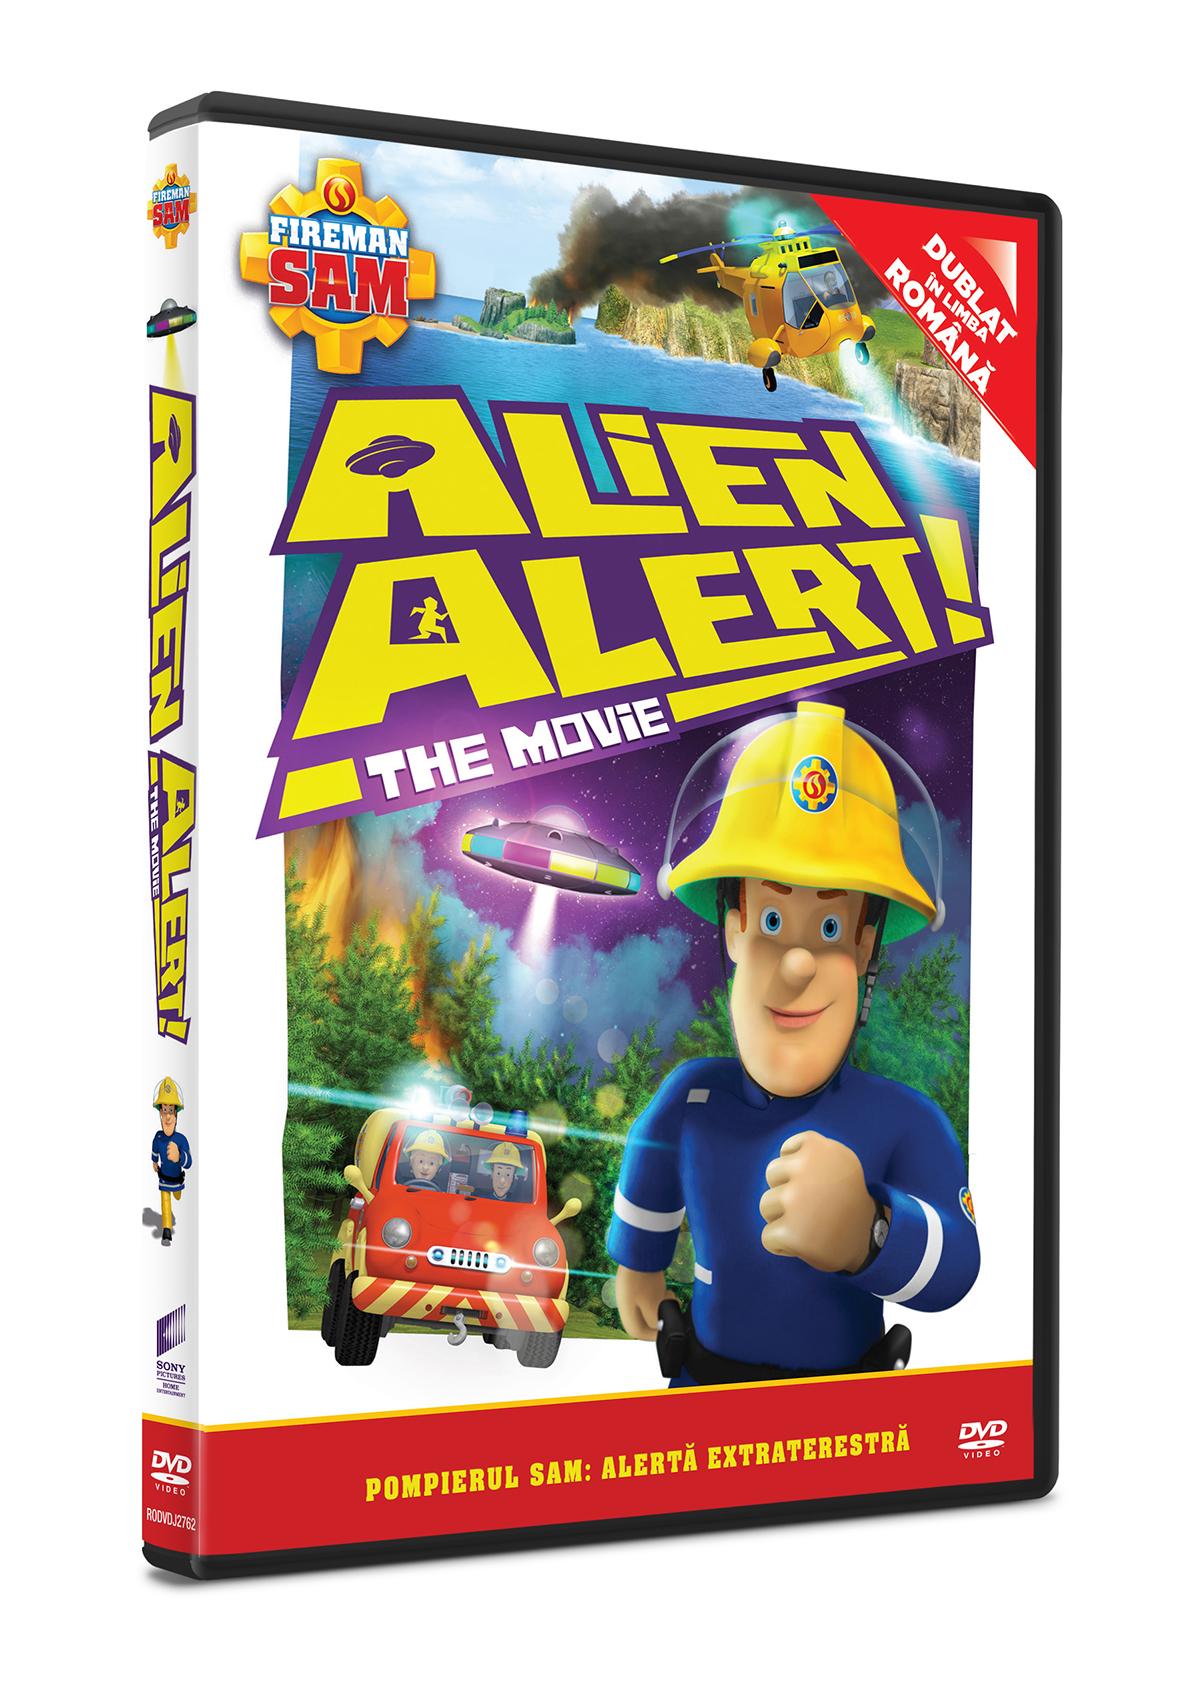 Pompierul Sam: Alerta extraterestra / Fireman Sam: Alien Alert! The Movie